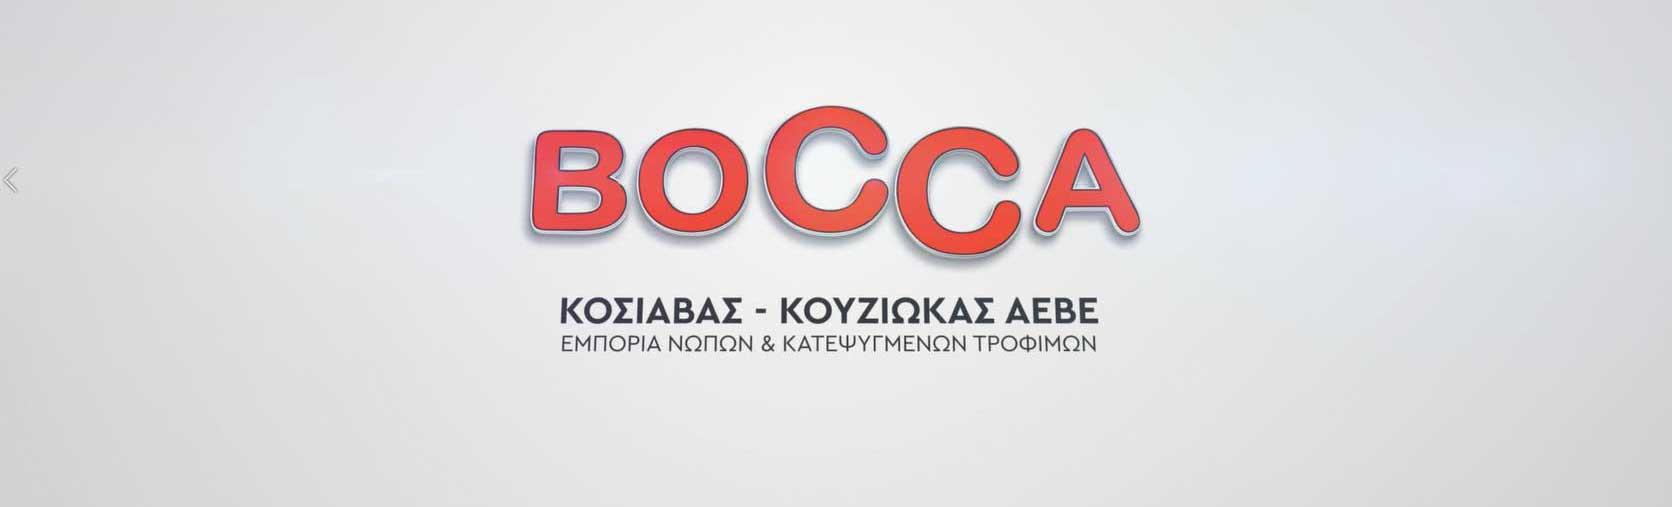 Bocca - Κόσιαβας - Κουζιώκας ΑΕΒΕ   Εμπόριο & Επεξεργασία Νωπών & Κατεψυγμένων Τροφίμων